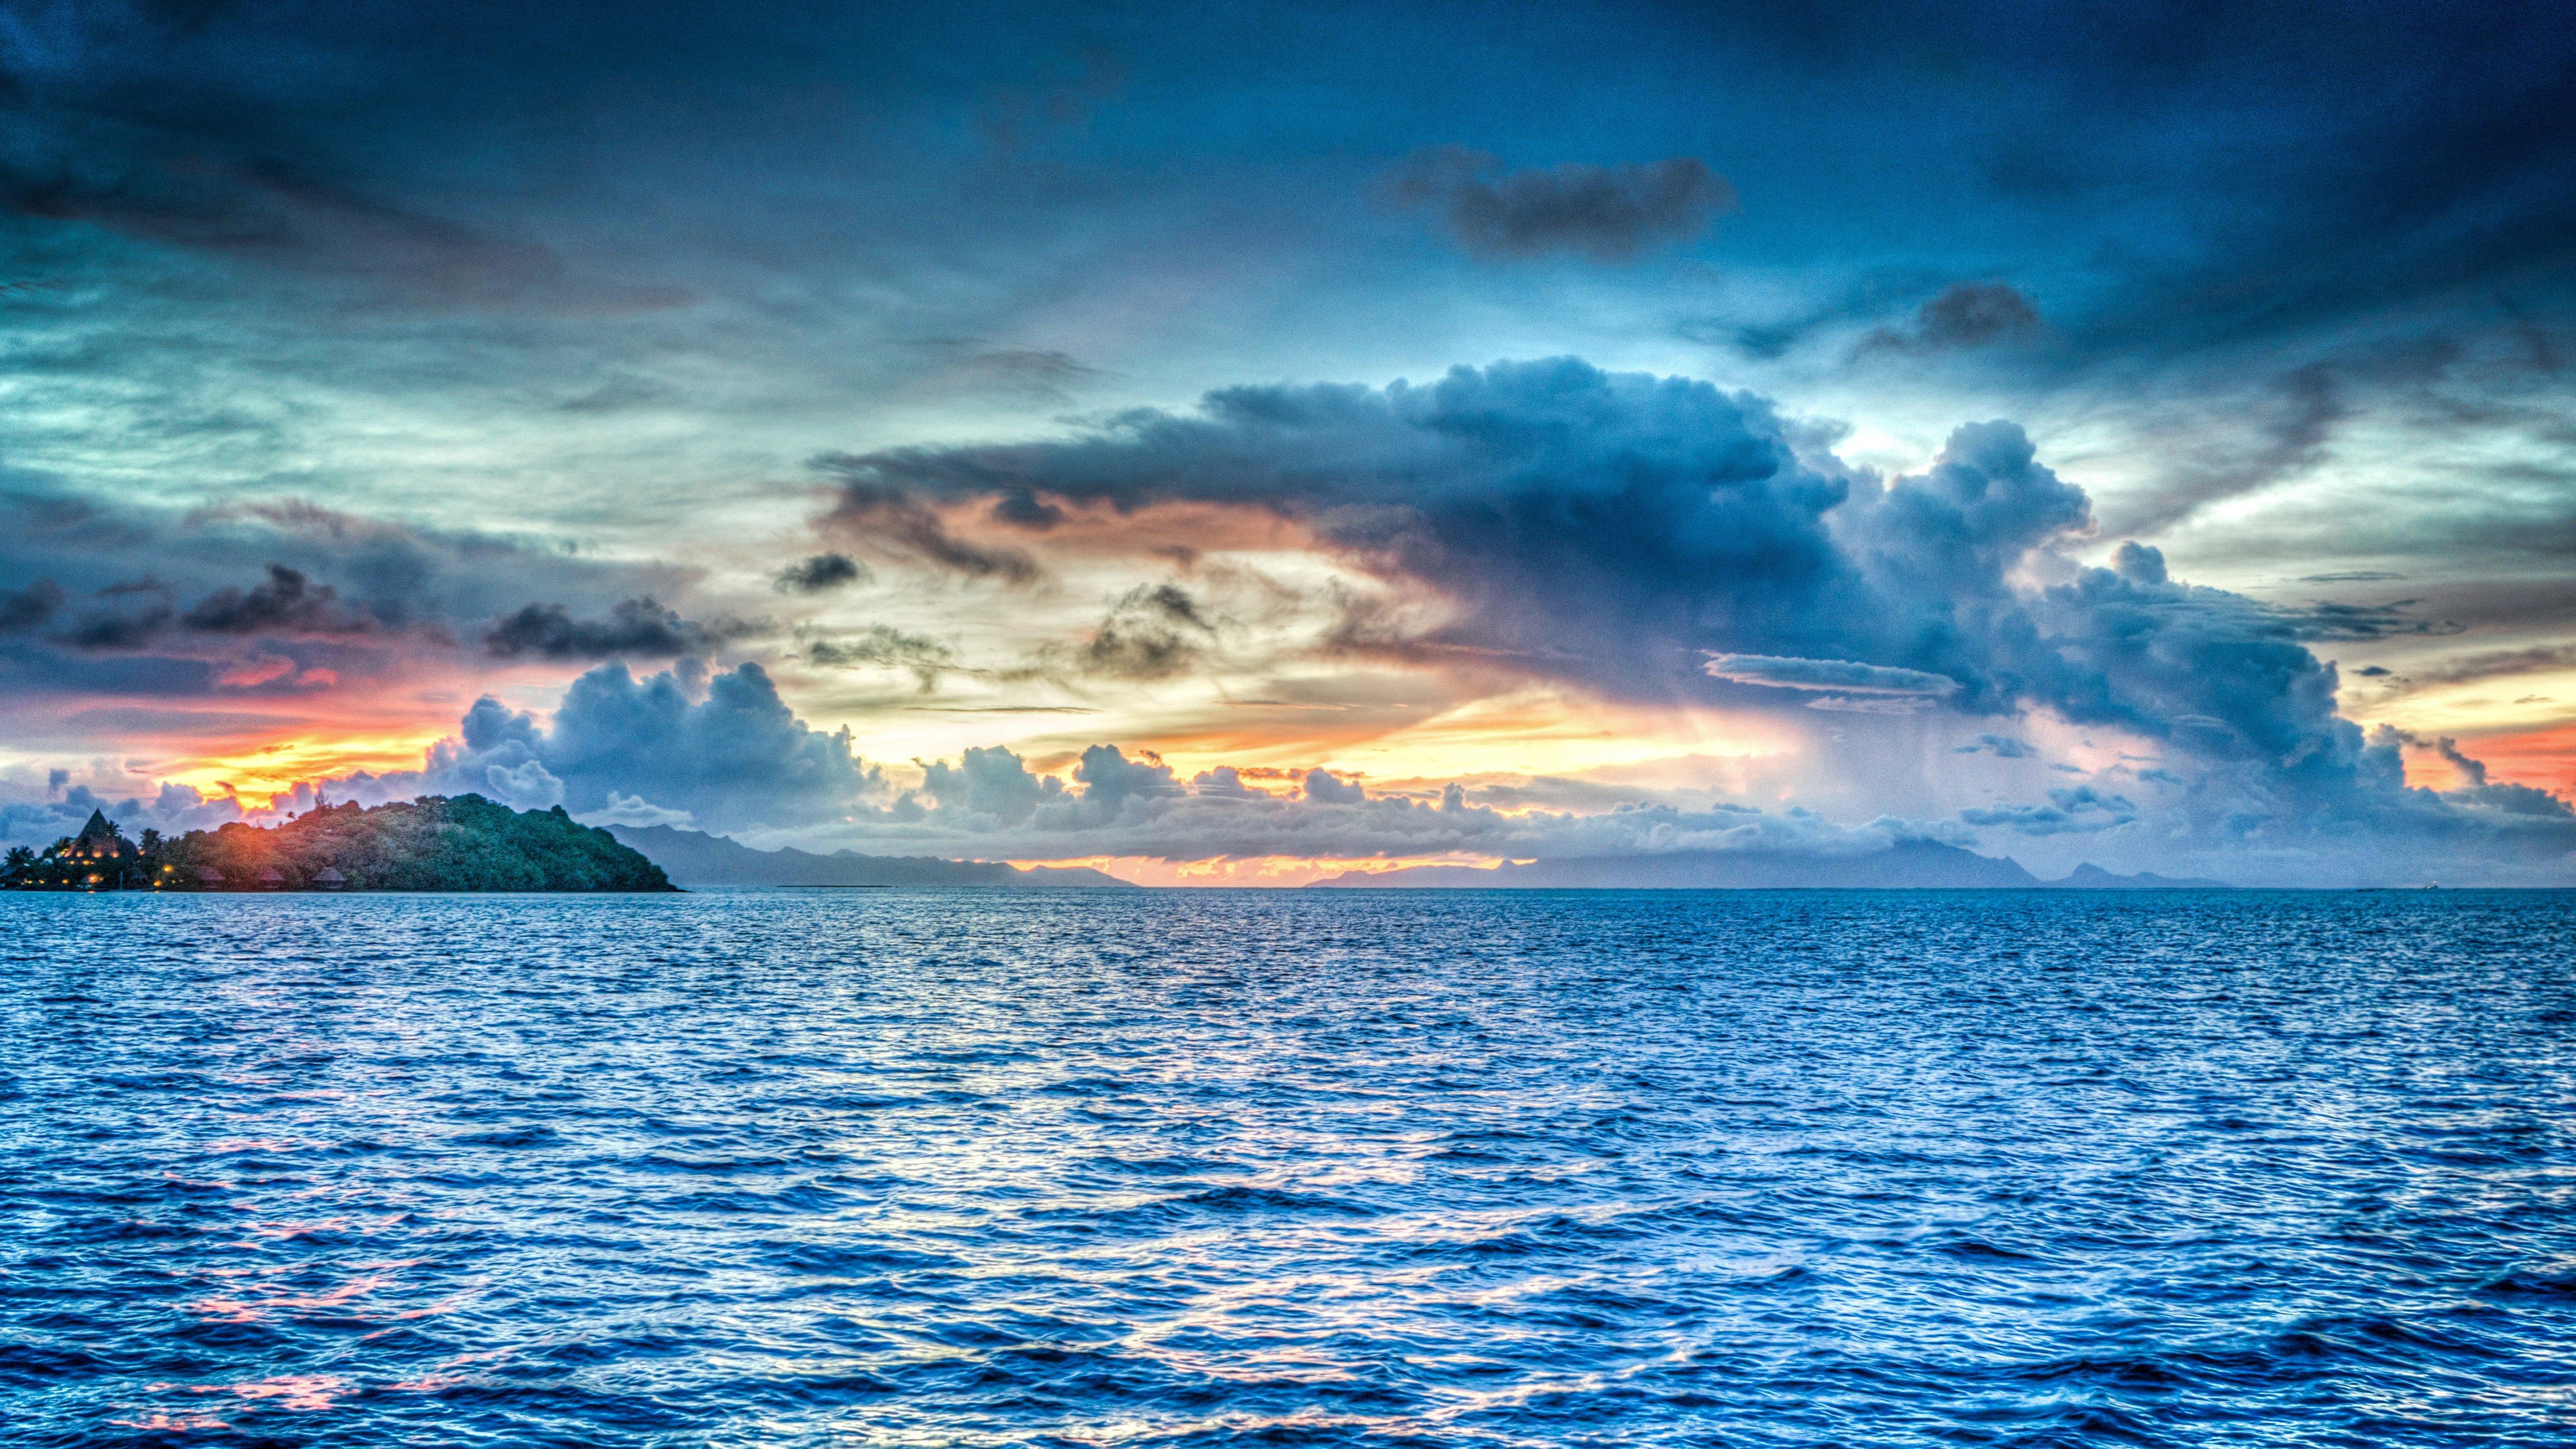 Wallpaper Bora Bora at sunset